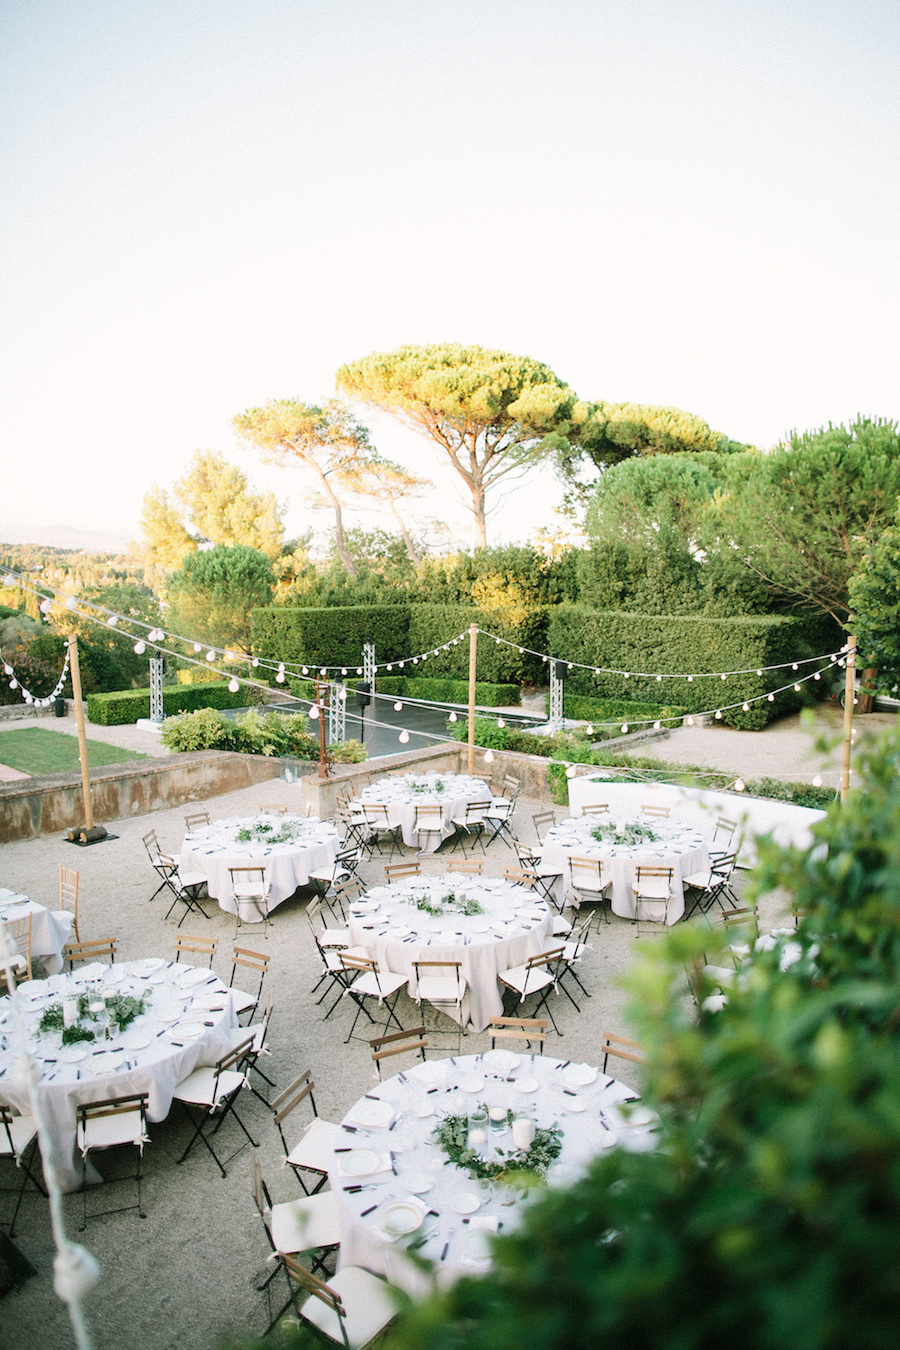 saya-photography-wedding-french-riviera-rustic-antibes-la-bastide-du-roy-91.jpg